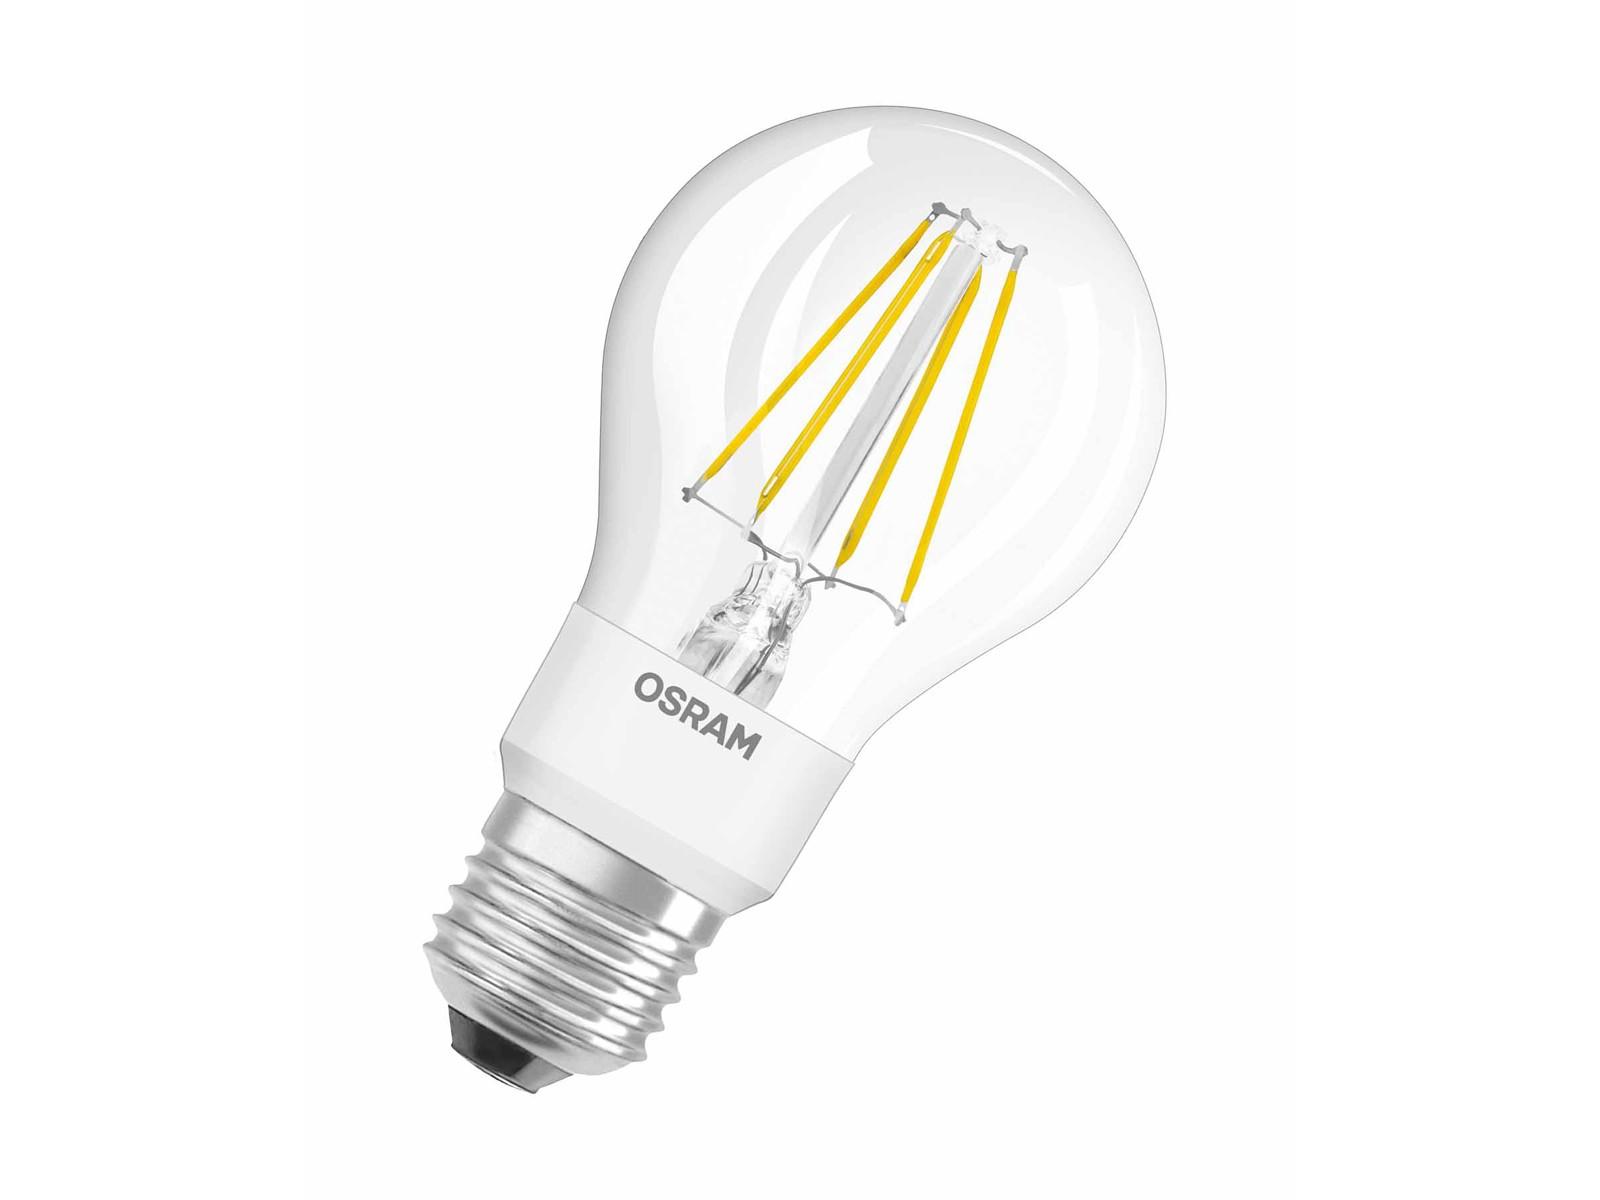 osram led retrofit filament 7w a 55 glowdim e27 750 lumen warm wei 1700 2700k dimmbar. Black Bedroom Furniture Sets. Home Design Ideas